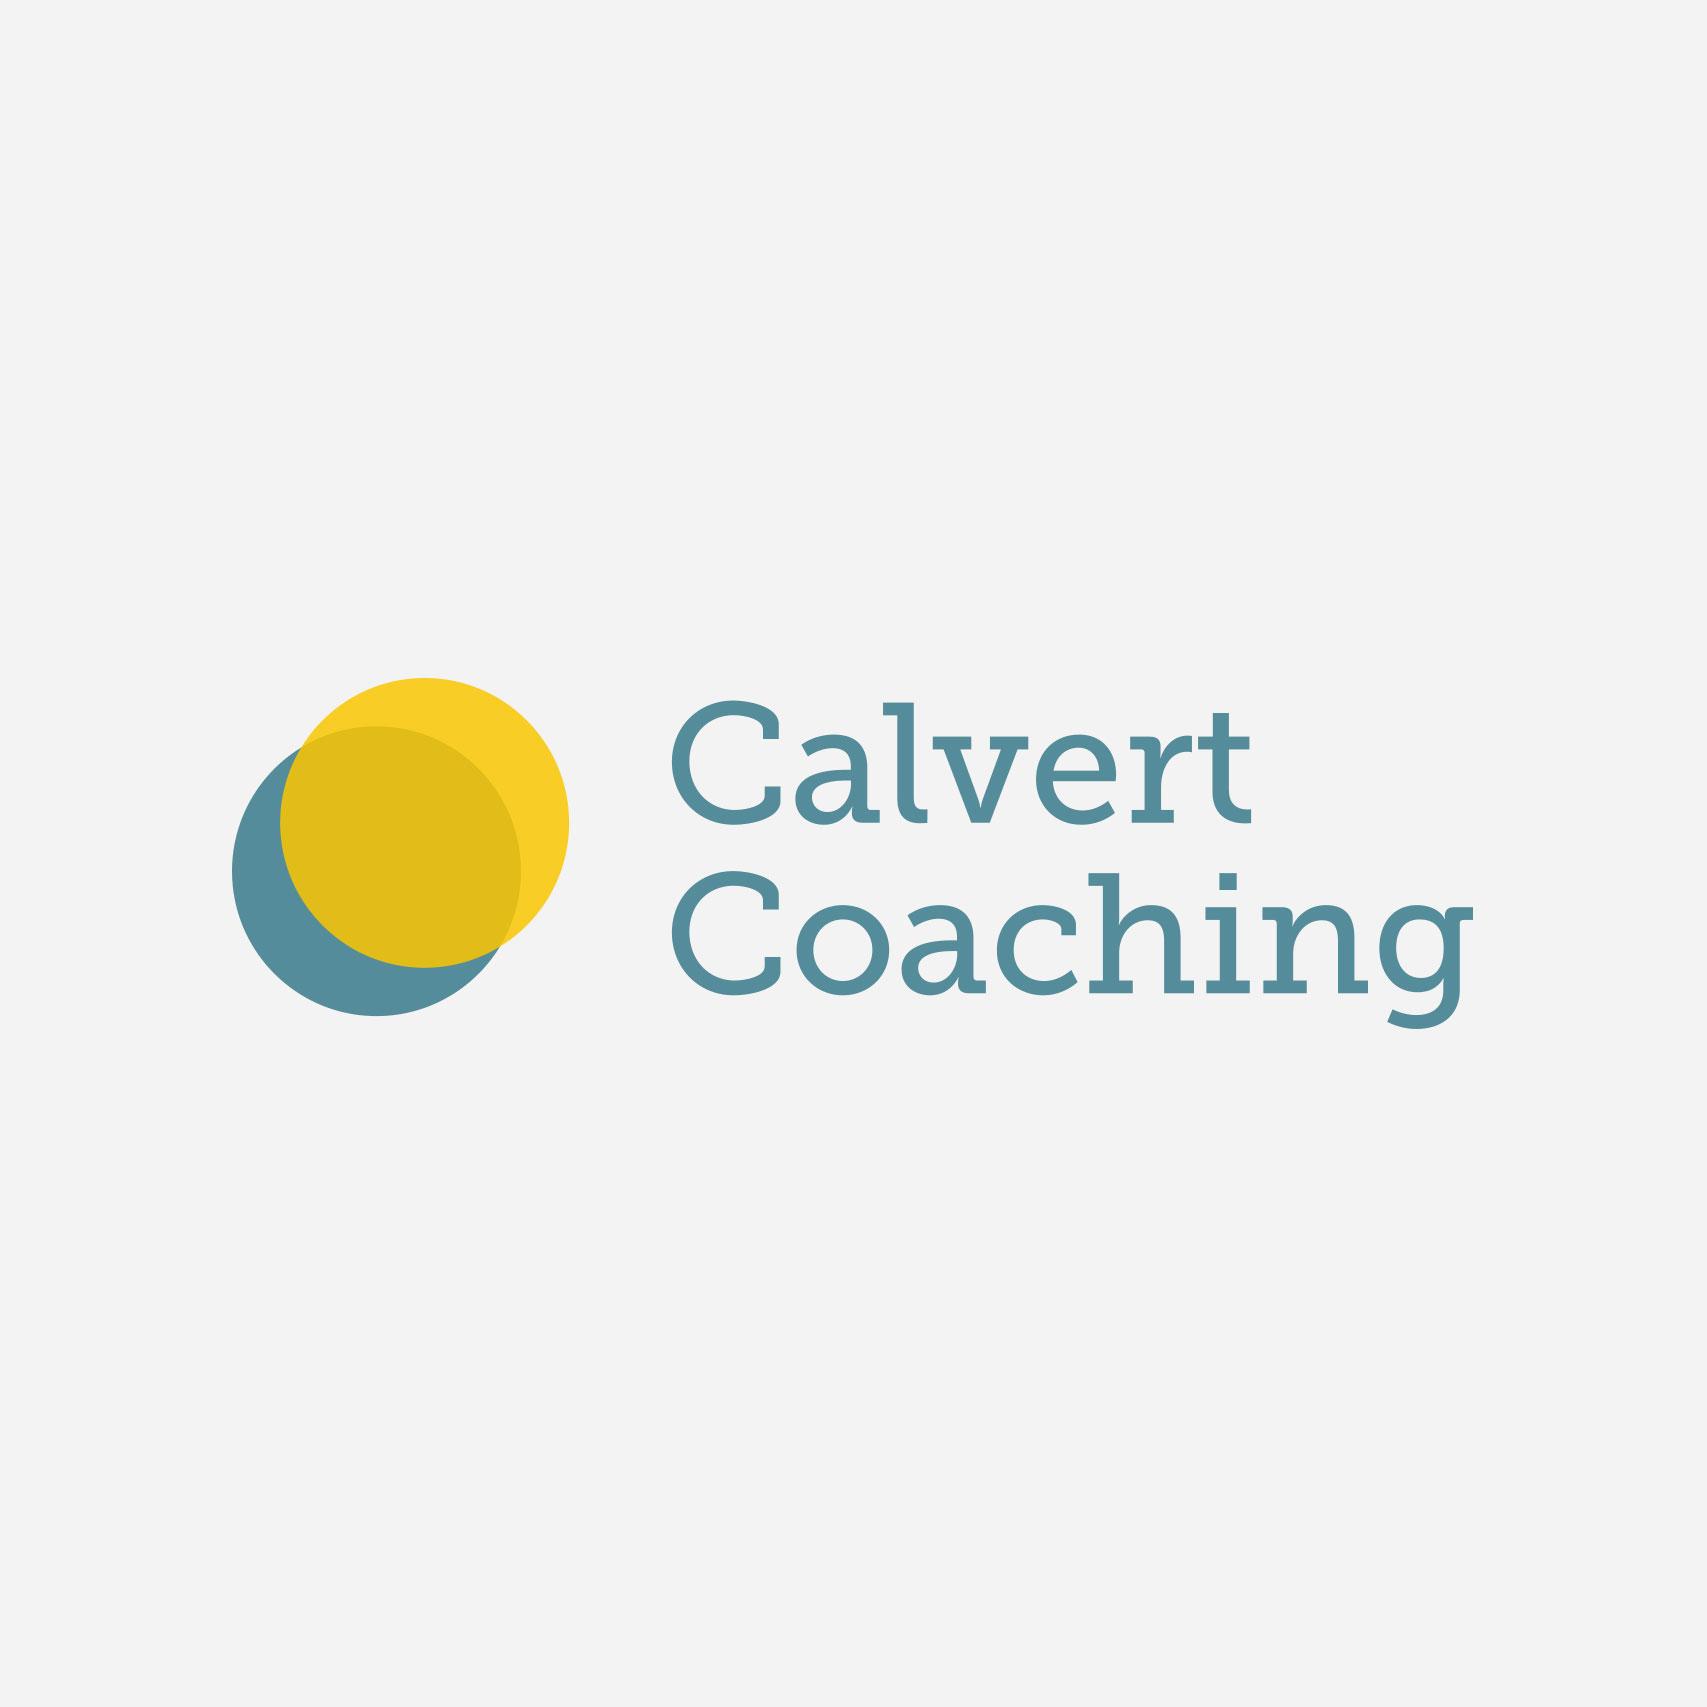 Small business logo design for Calvert Coaching London